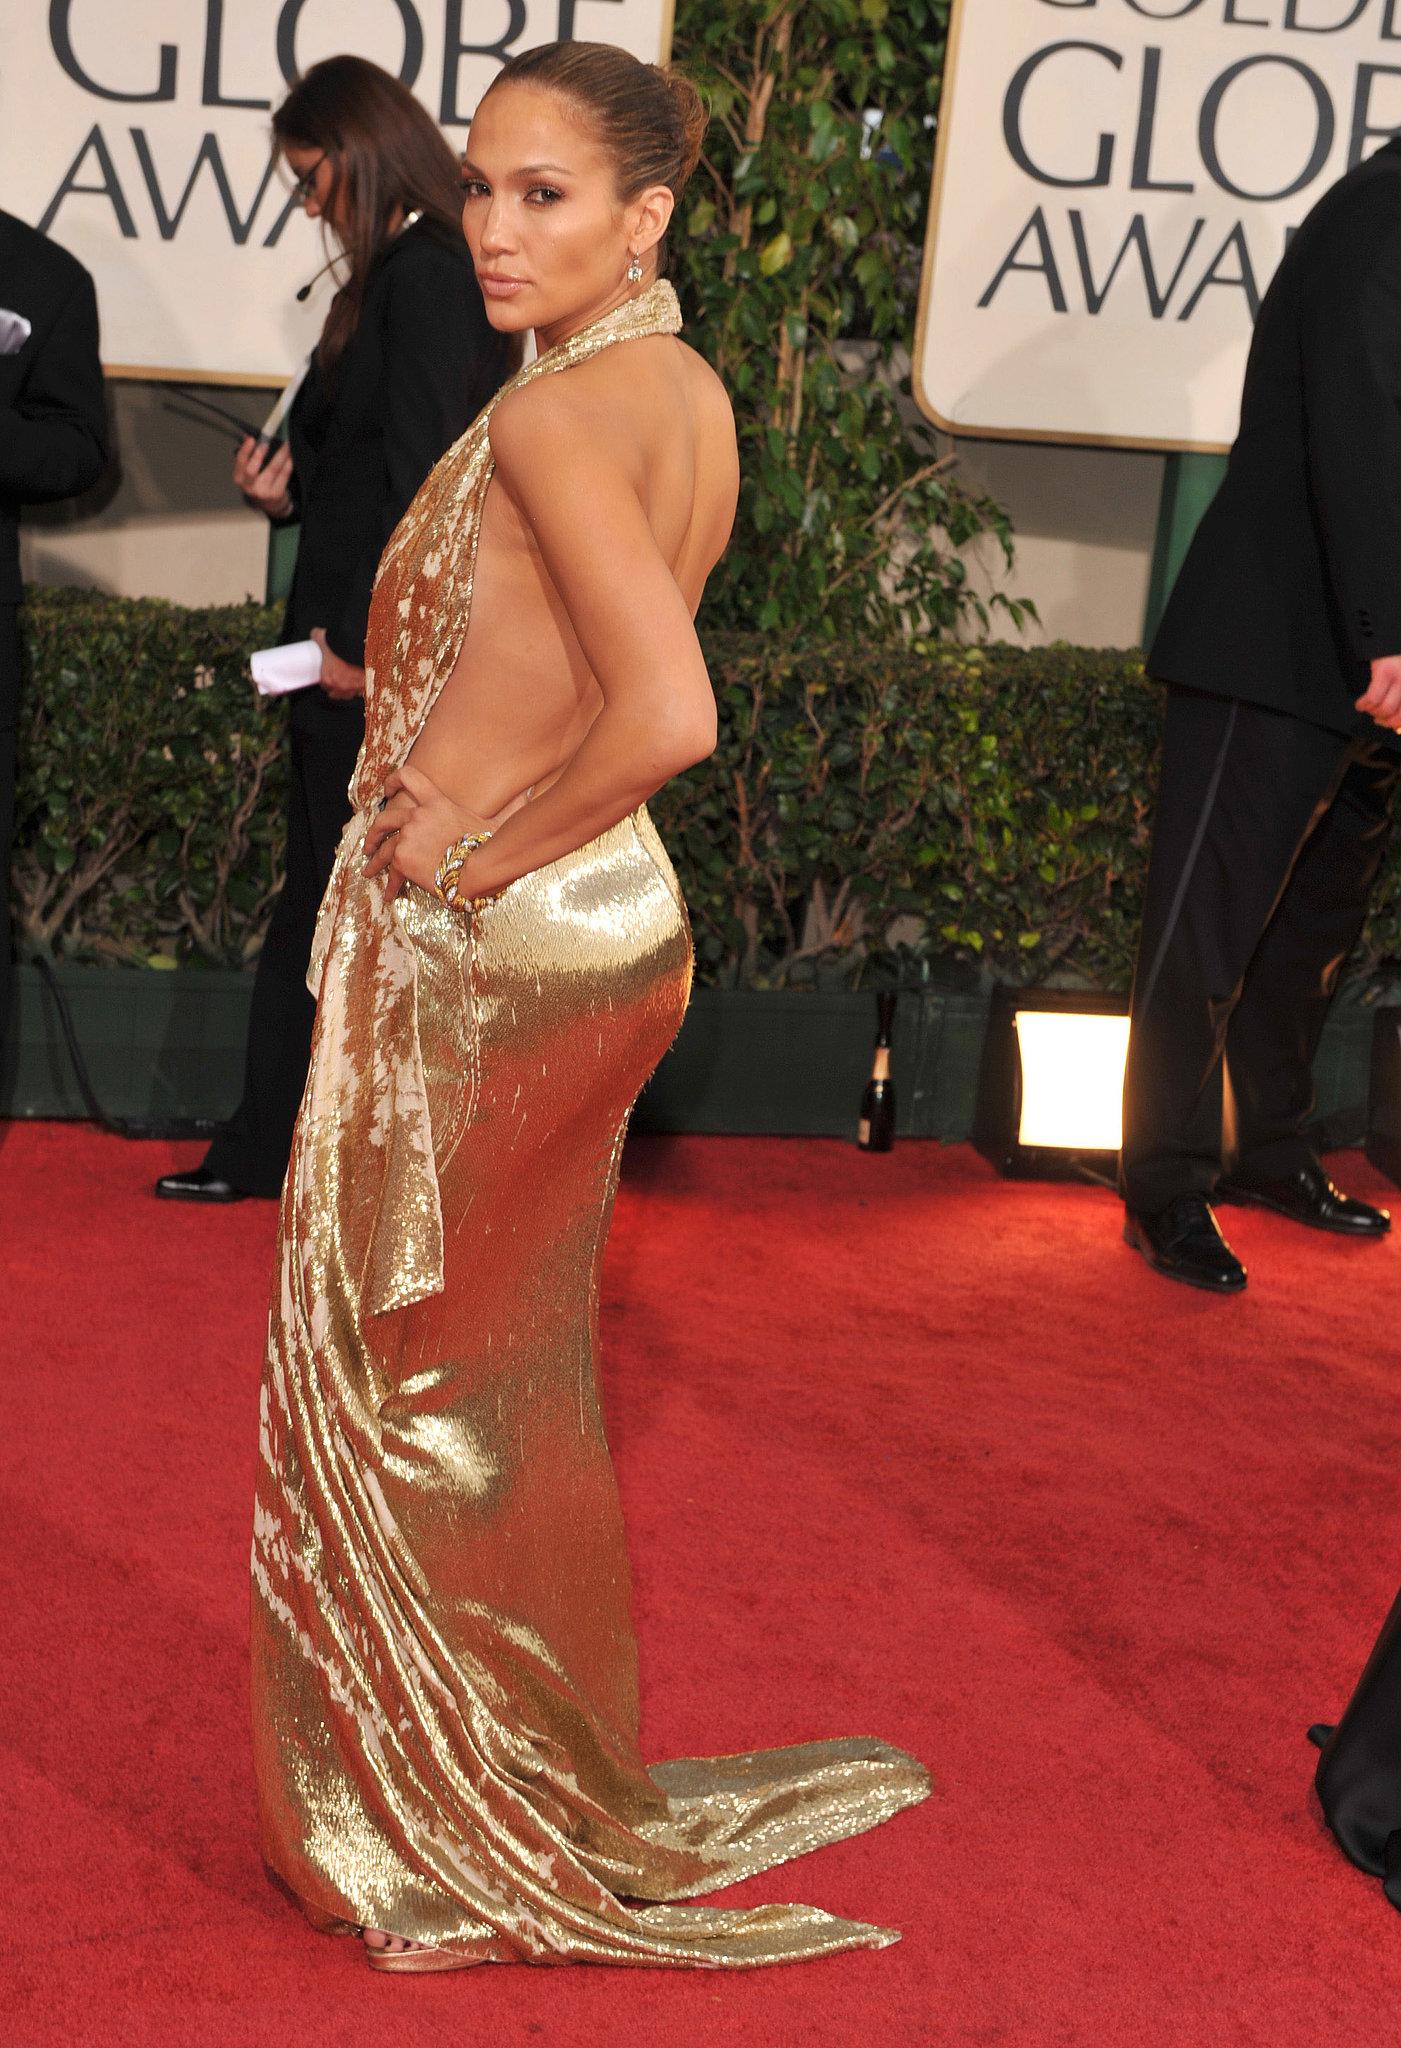 2009 J Lo S Sexiest Pictures Since The 90s Popsugar